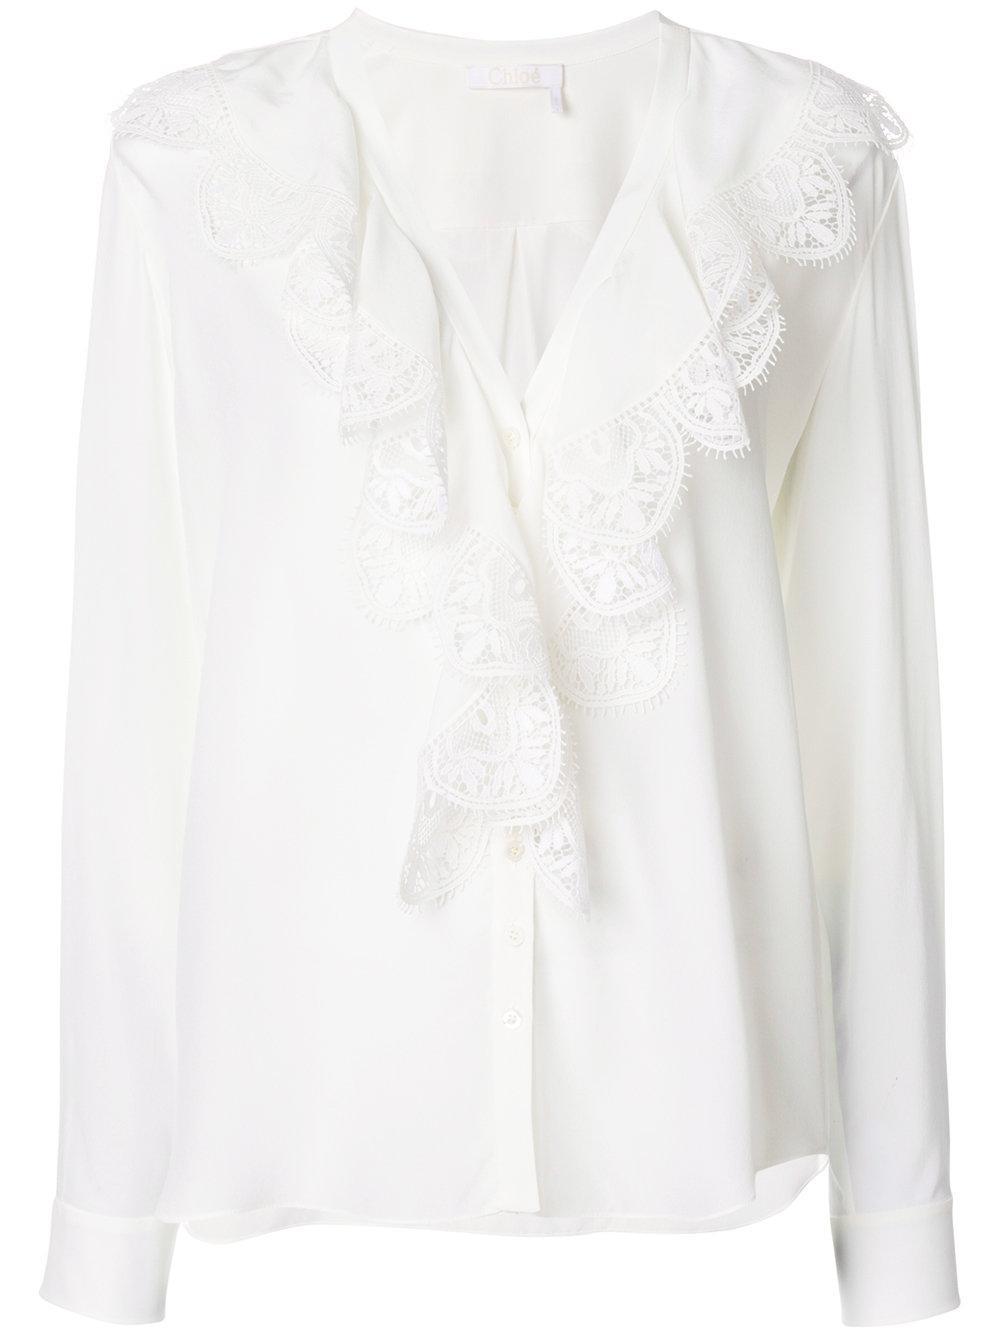 ChloÉ Ruffle Sleeved Blouse In White